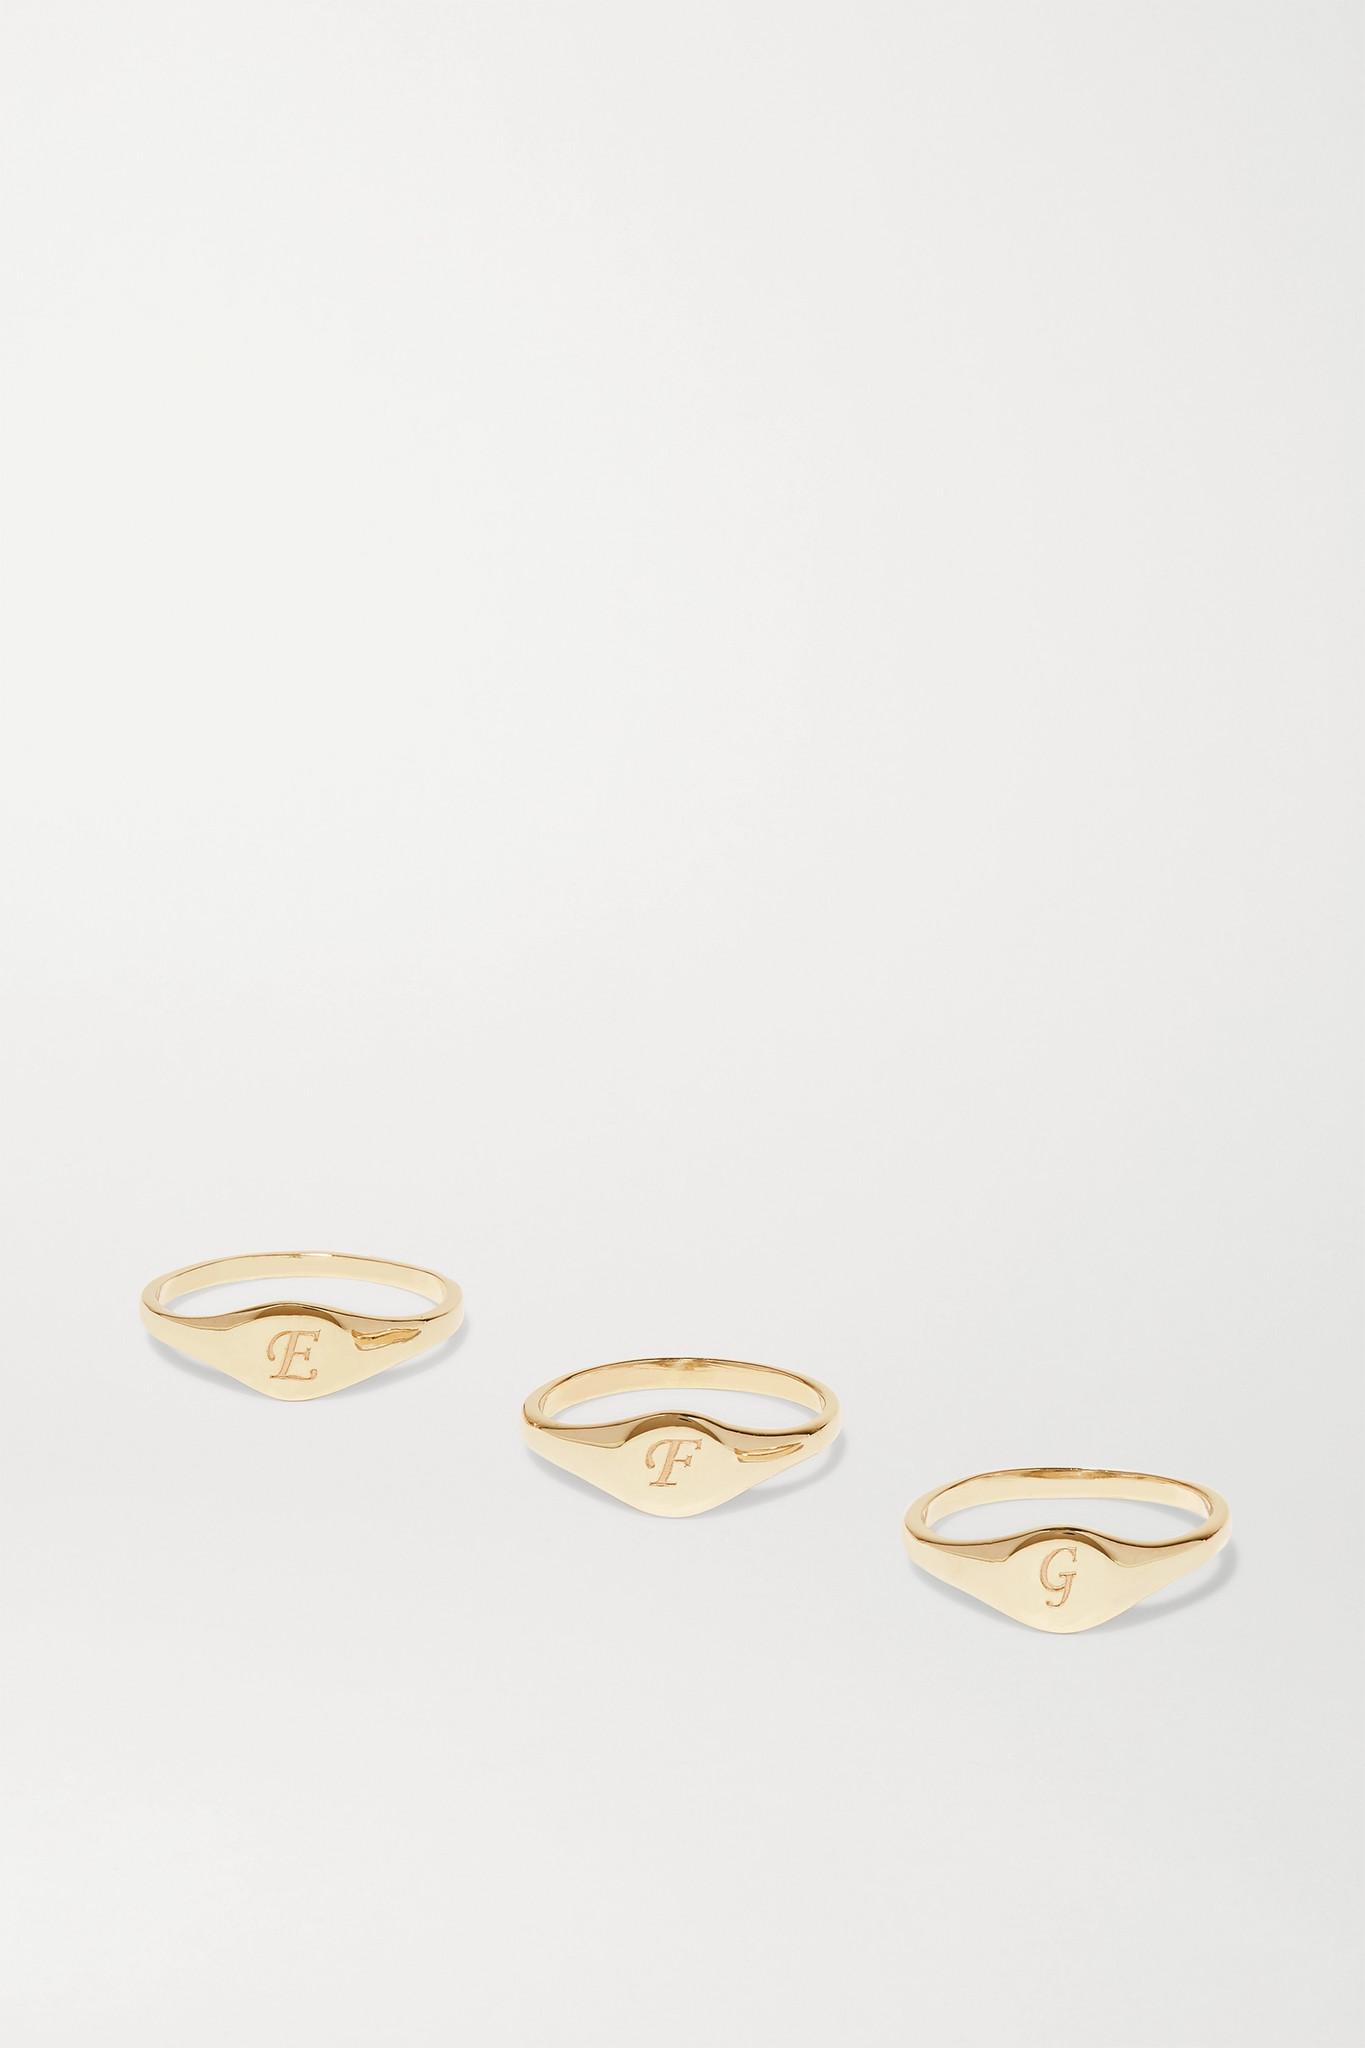 STONE AND STRAND - Alphabet Mini Pinky Gold Ring - J 3